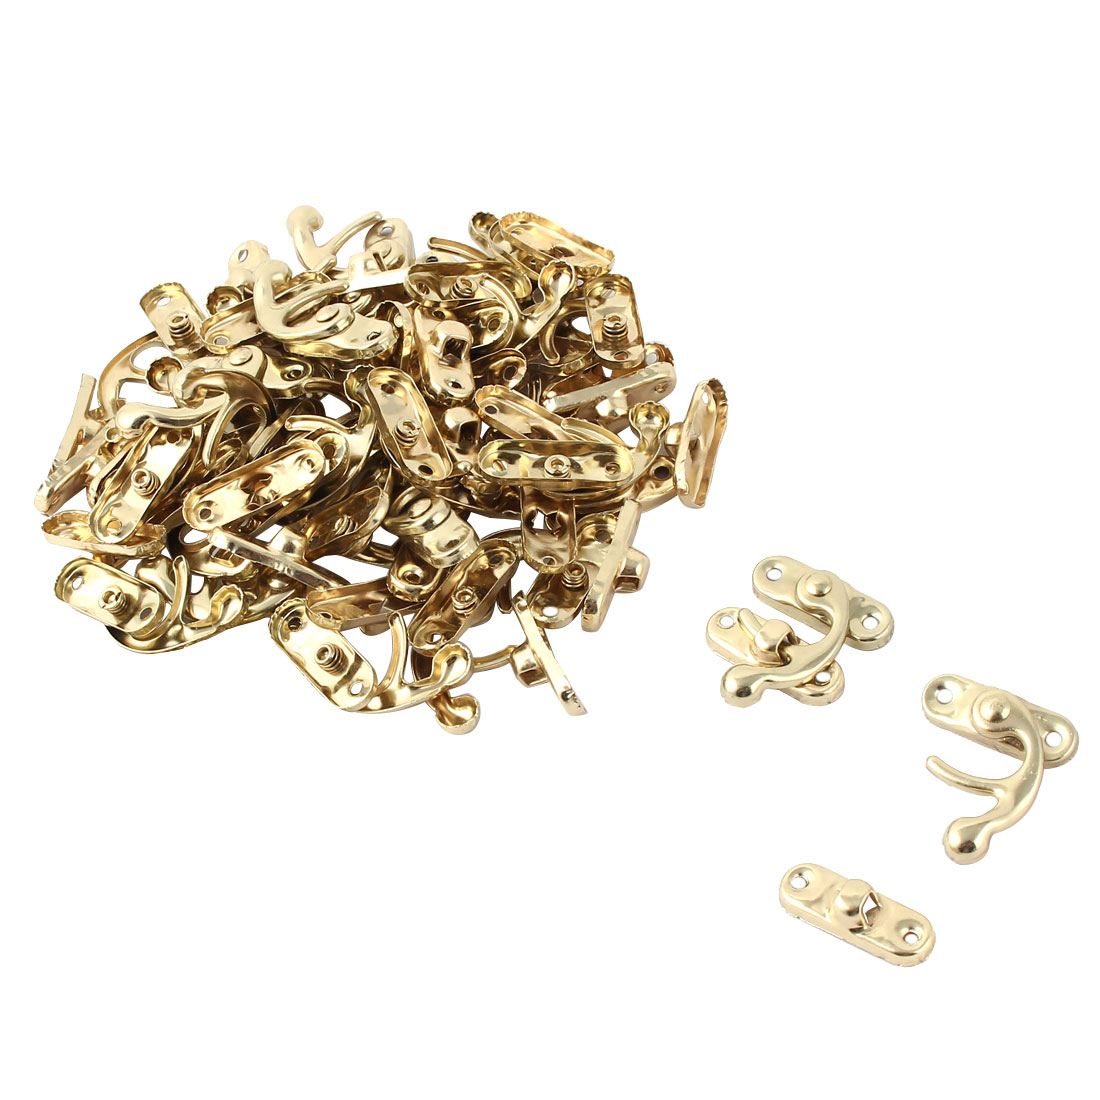 Home Metal Furniture Drawer Box Lock Clasp Closure Latch Handle Gold Tone 30 Pcs